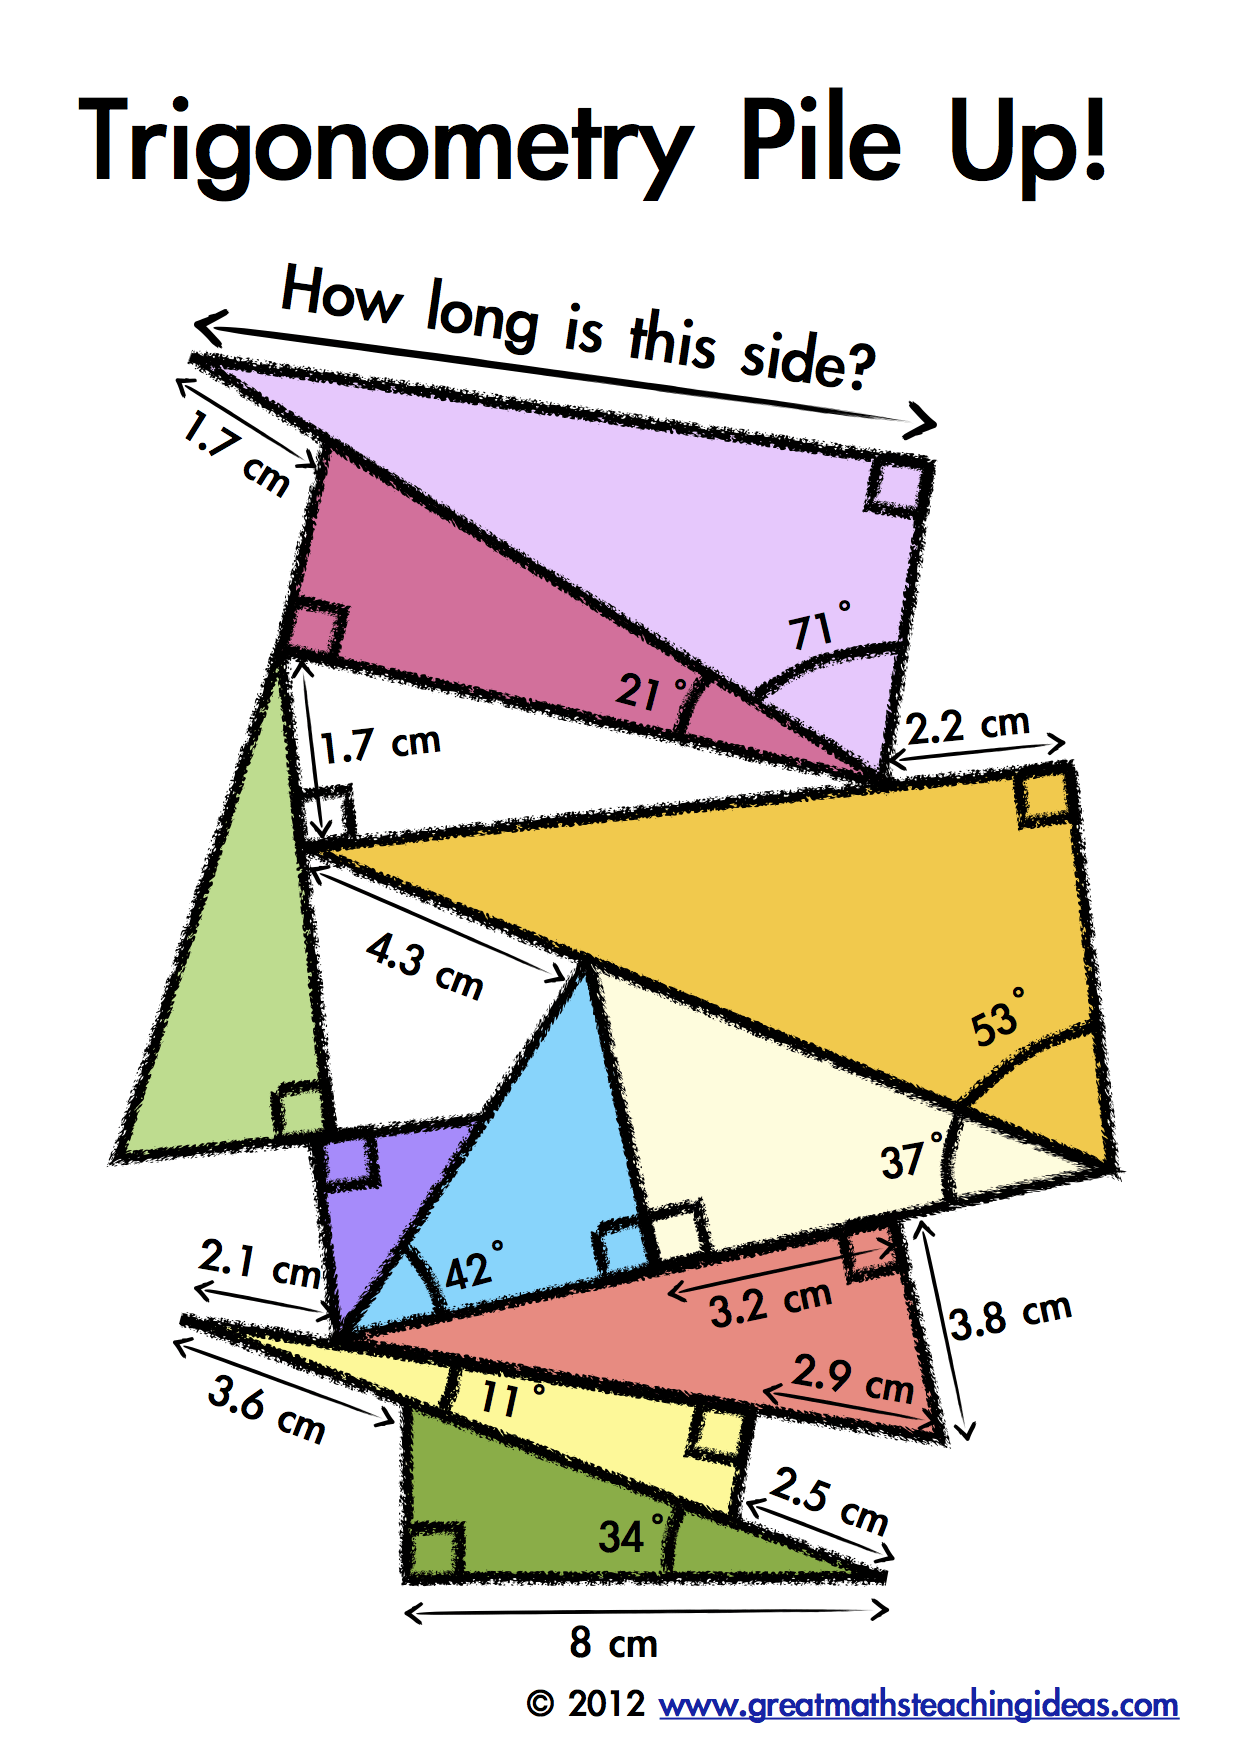 Trigonometry Pile Up! (With images)   Trigonometry ...